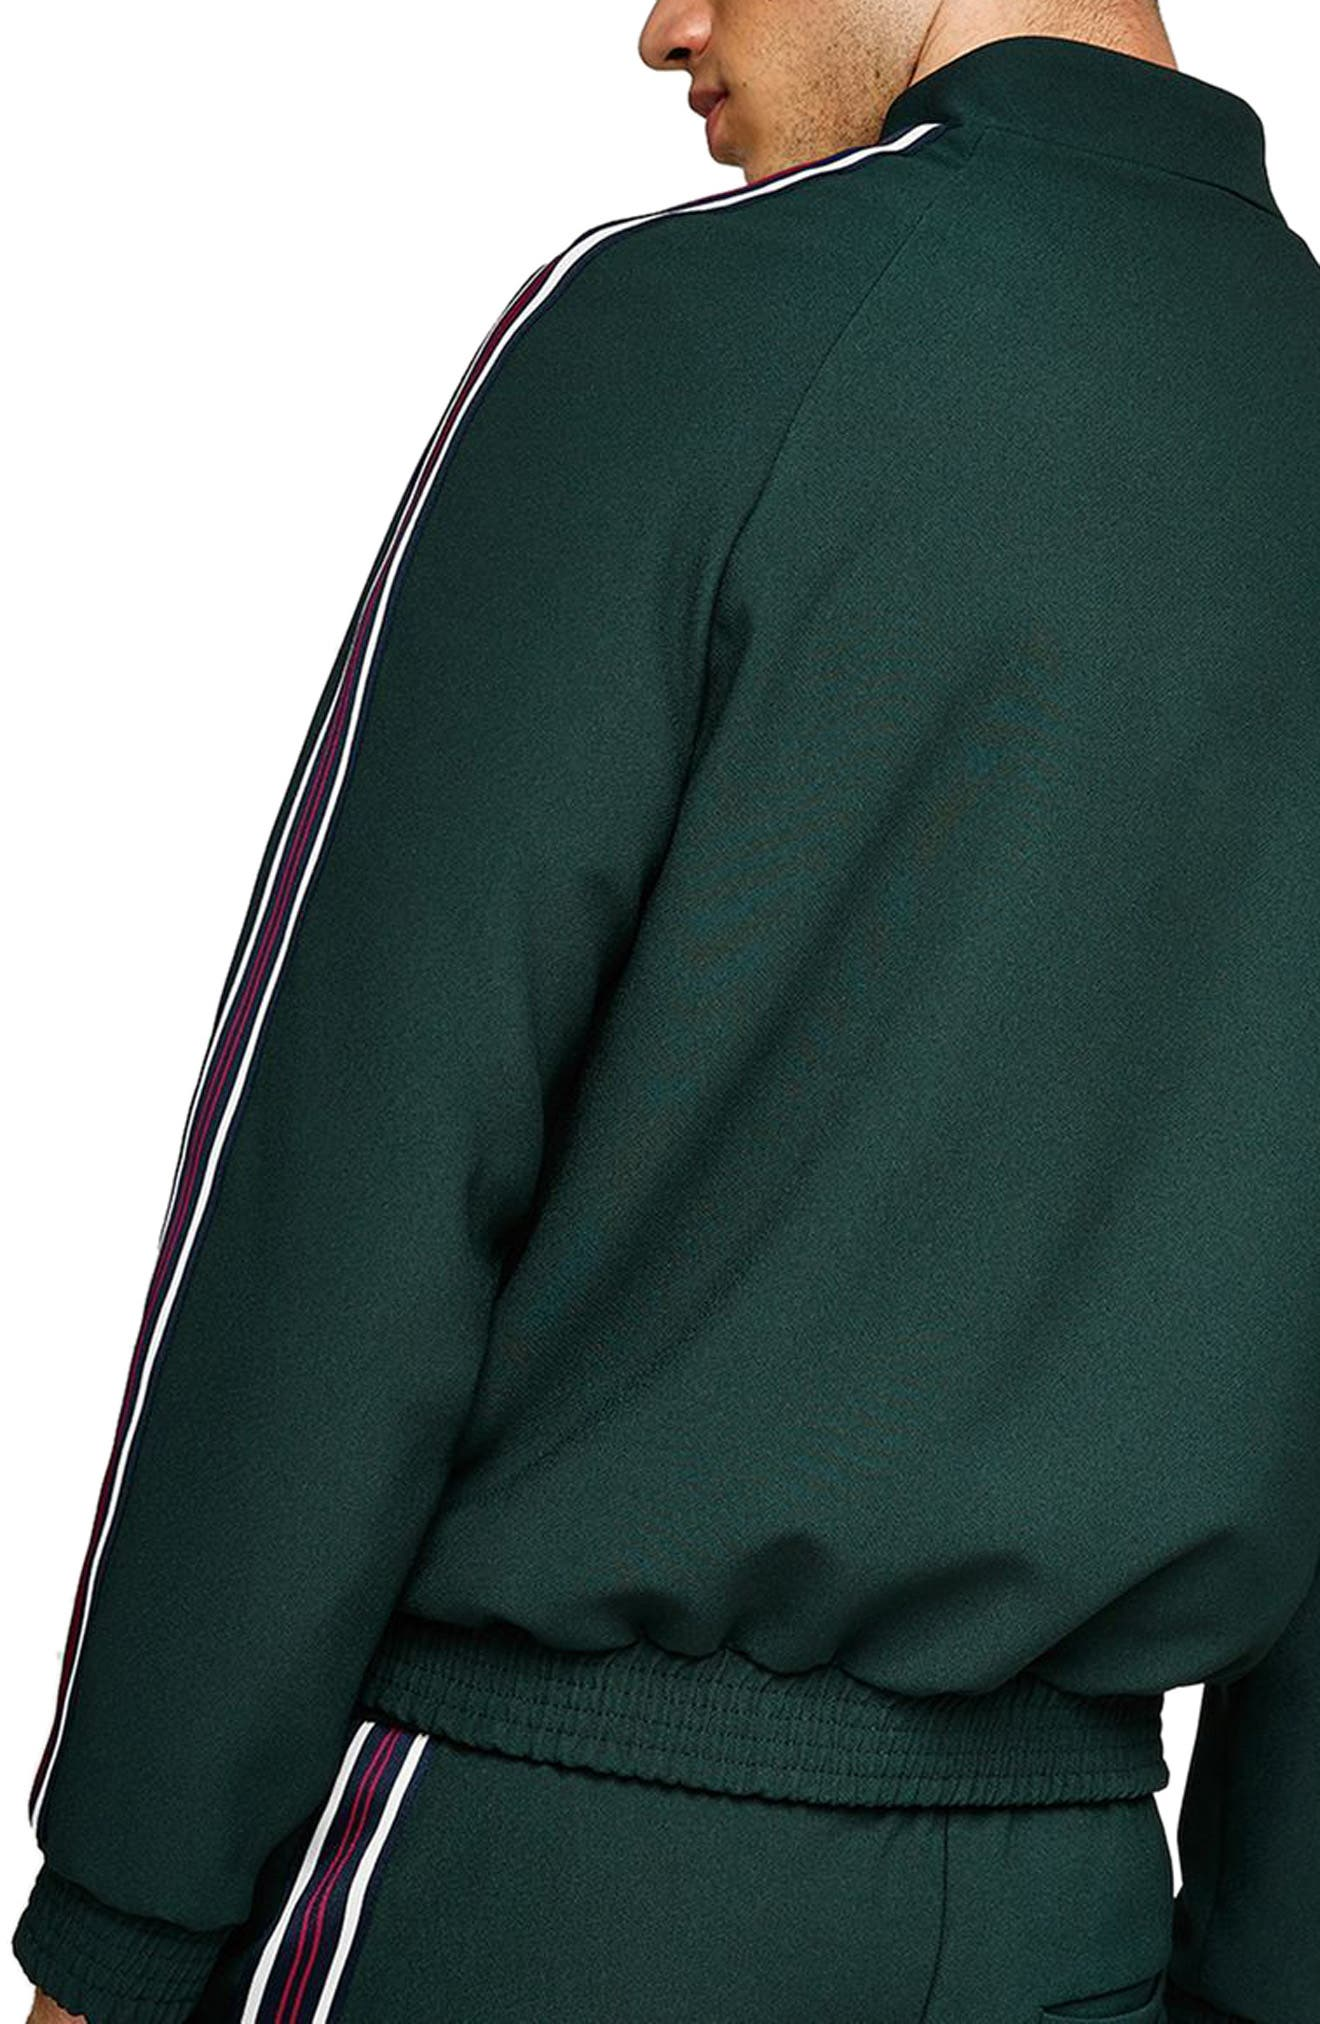 Track Jacket,                             Main thumbnail 1, color,                             GREEN MULTI